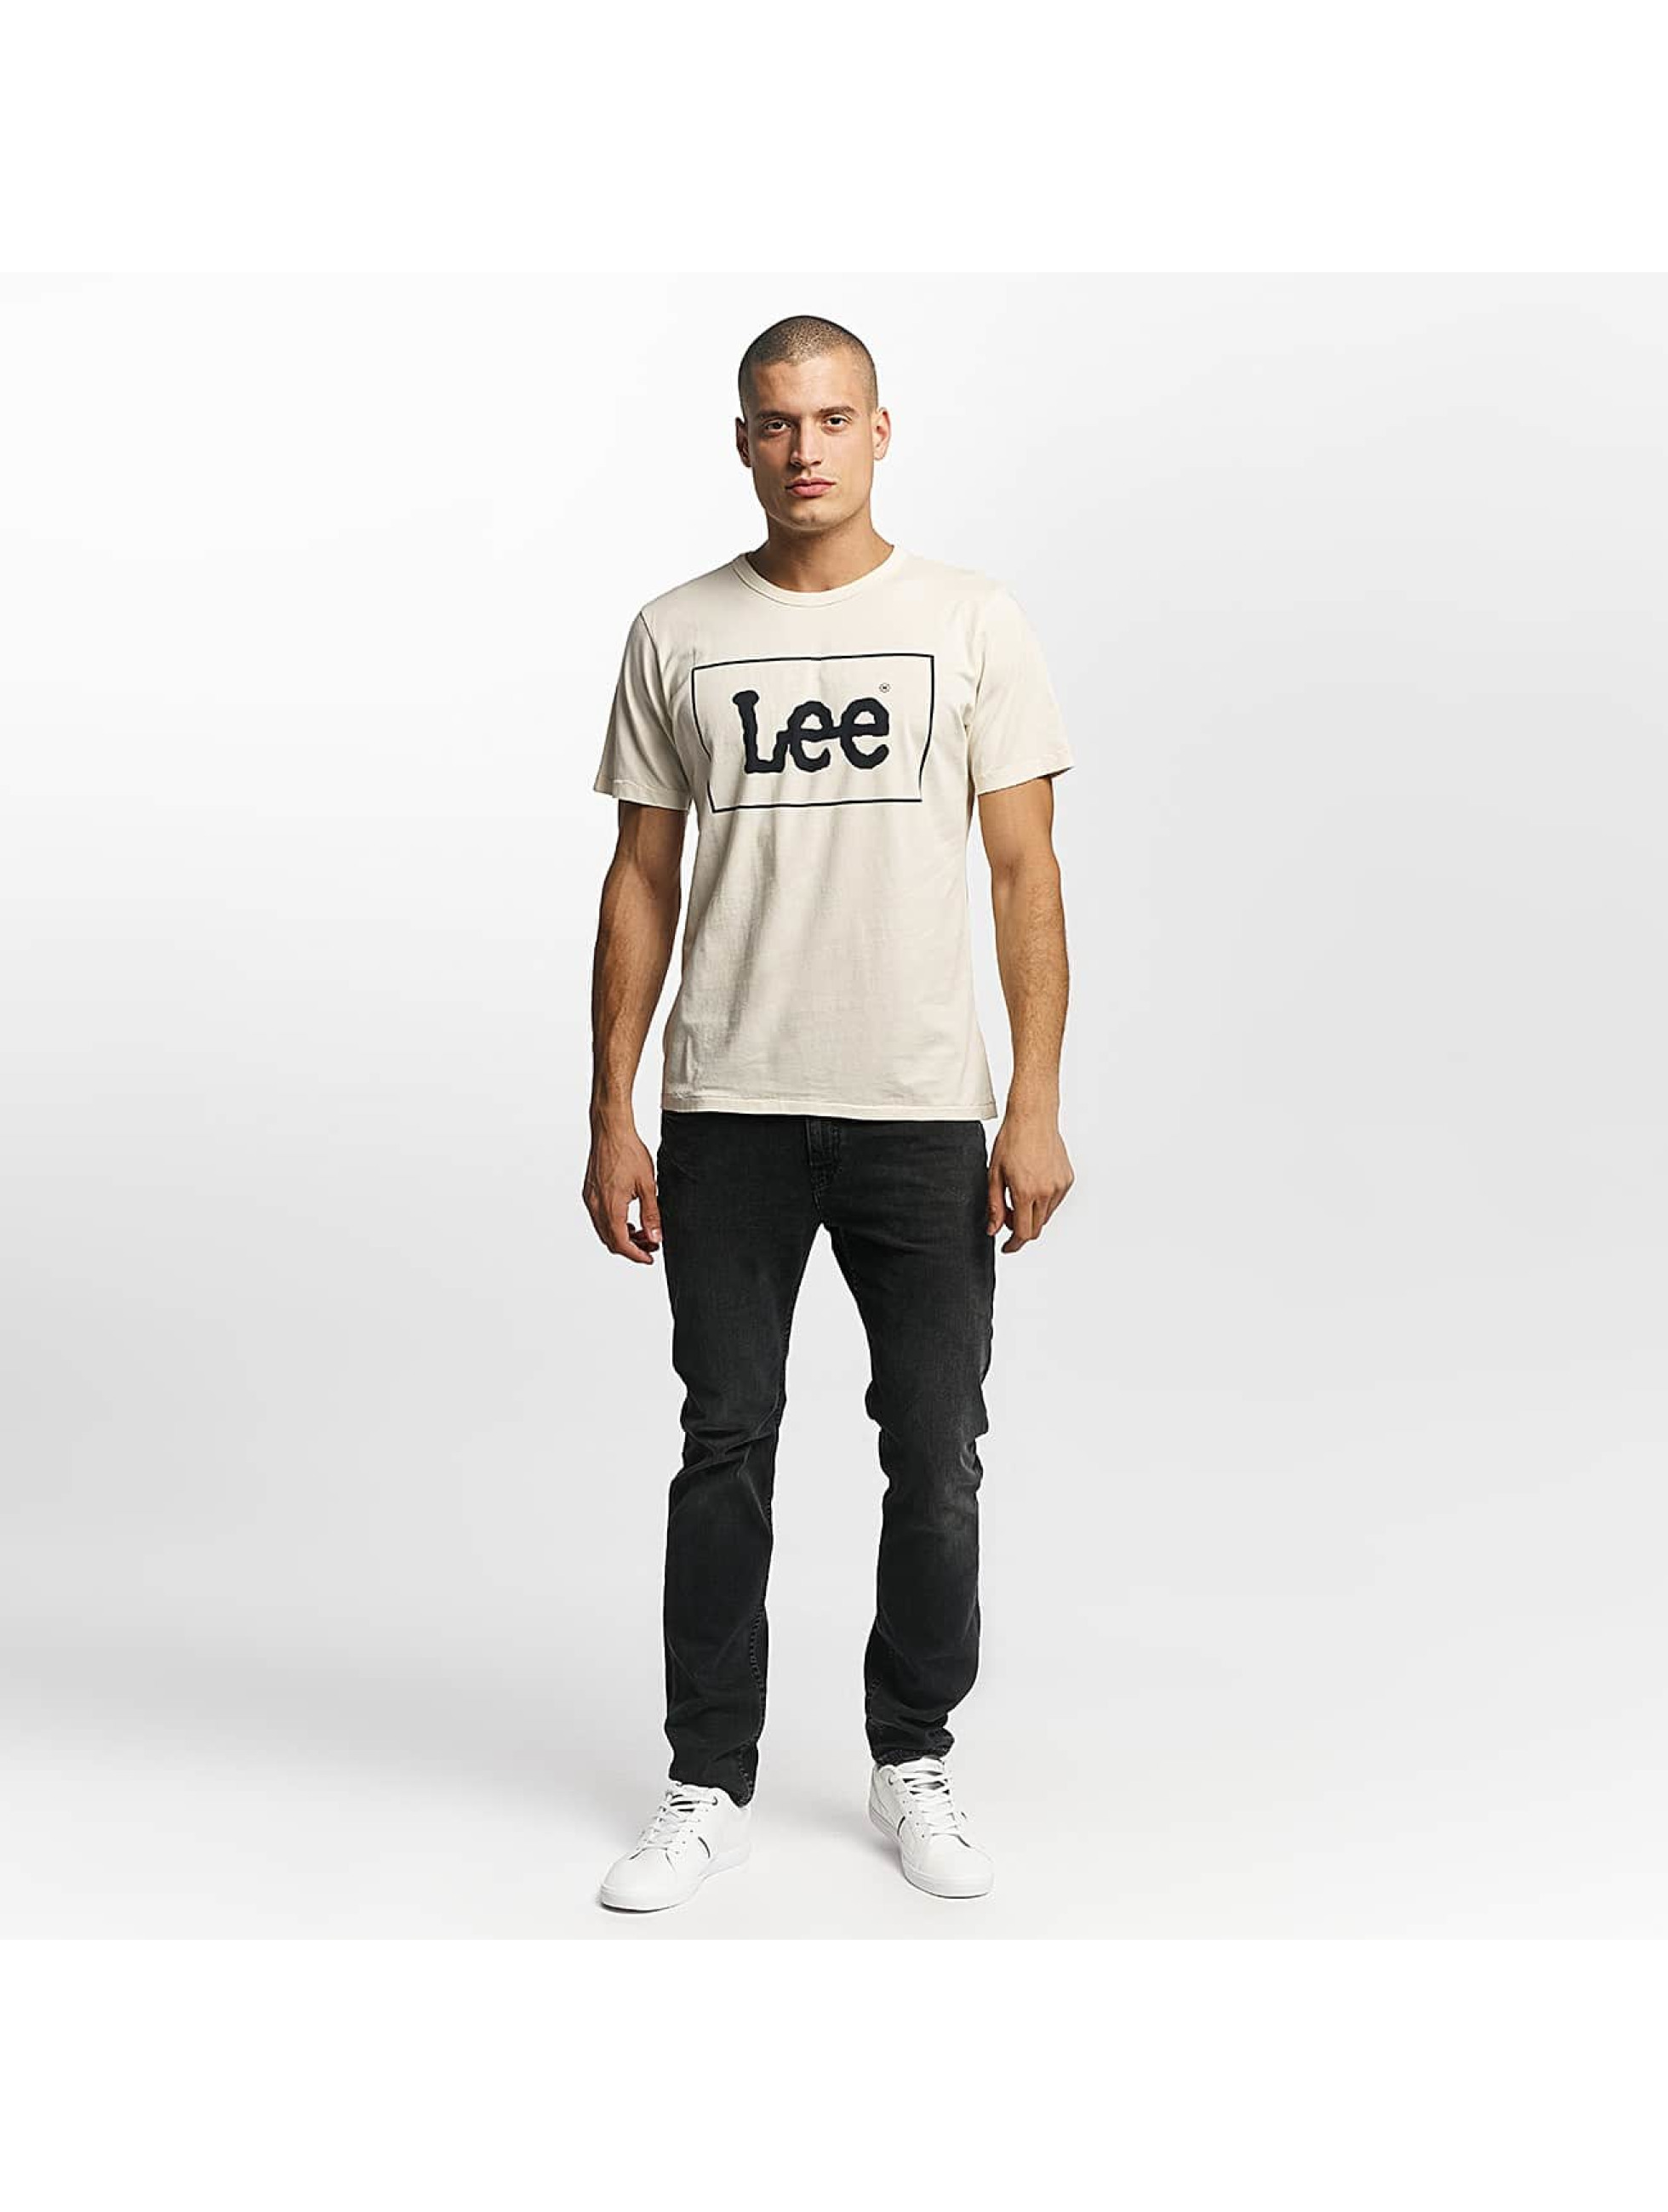 Lee T-skjorter Lee hvit